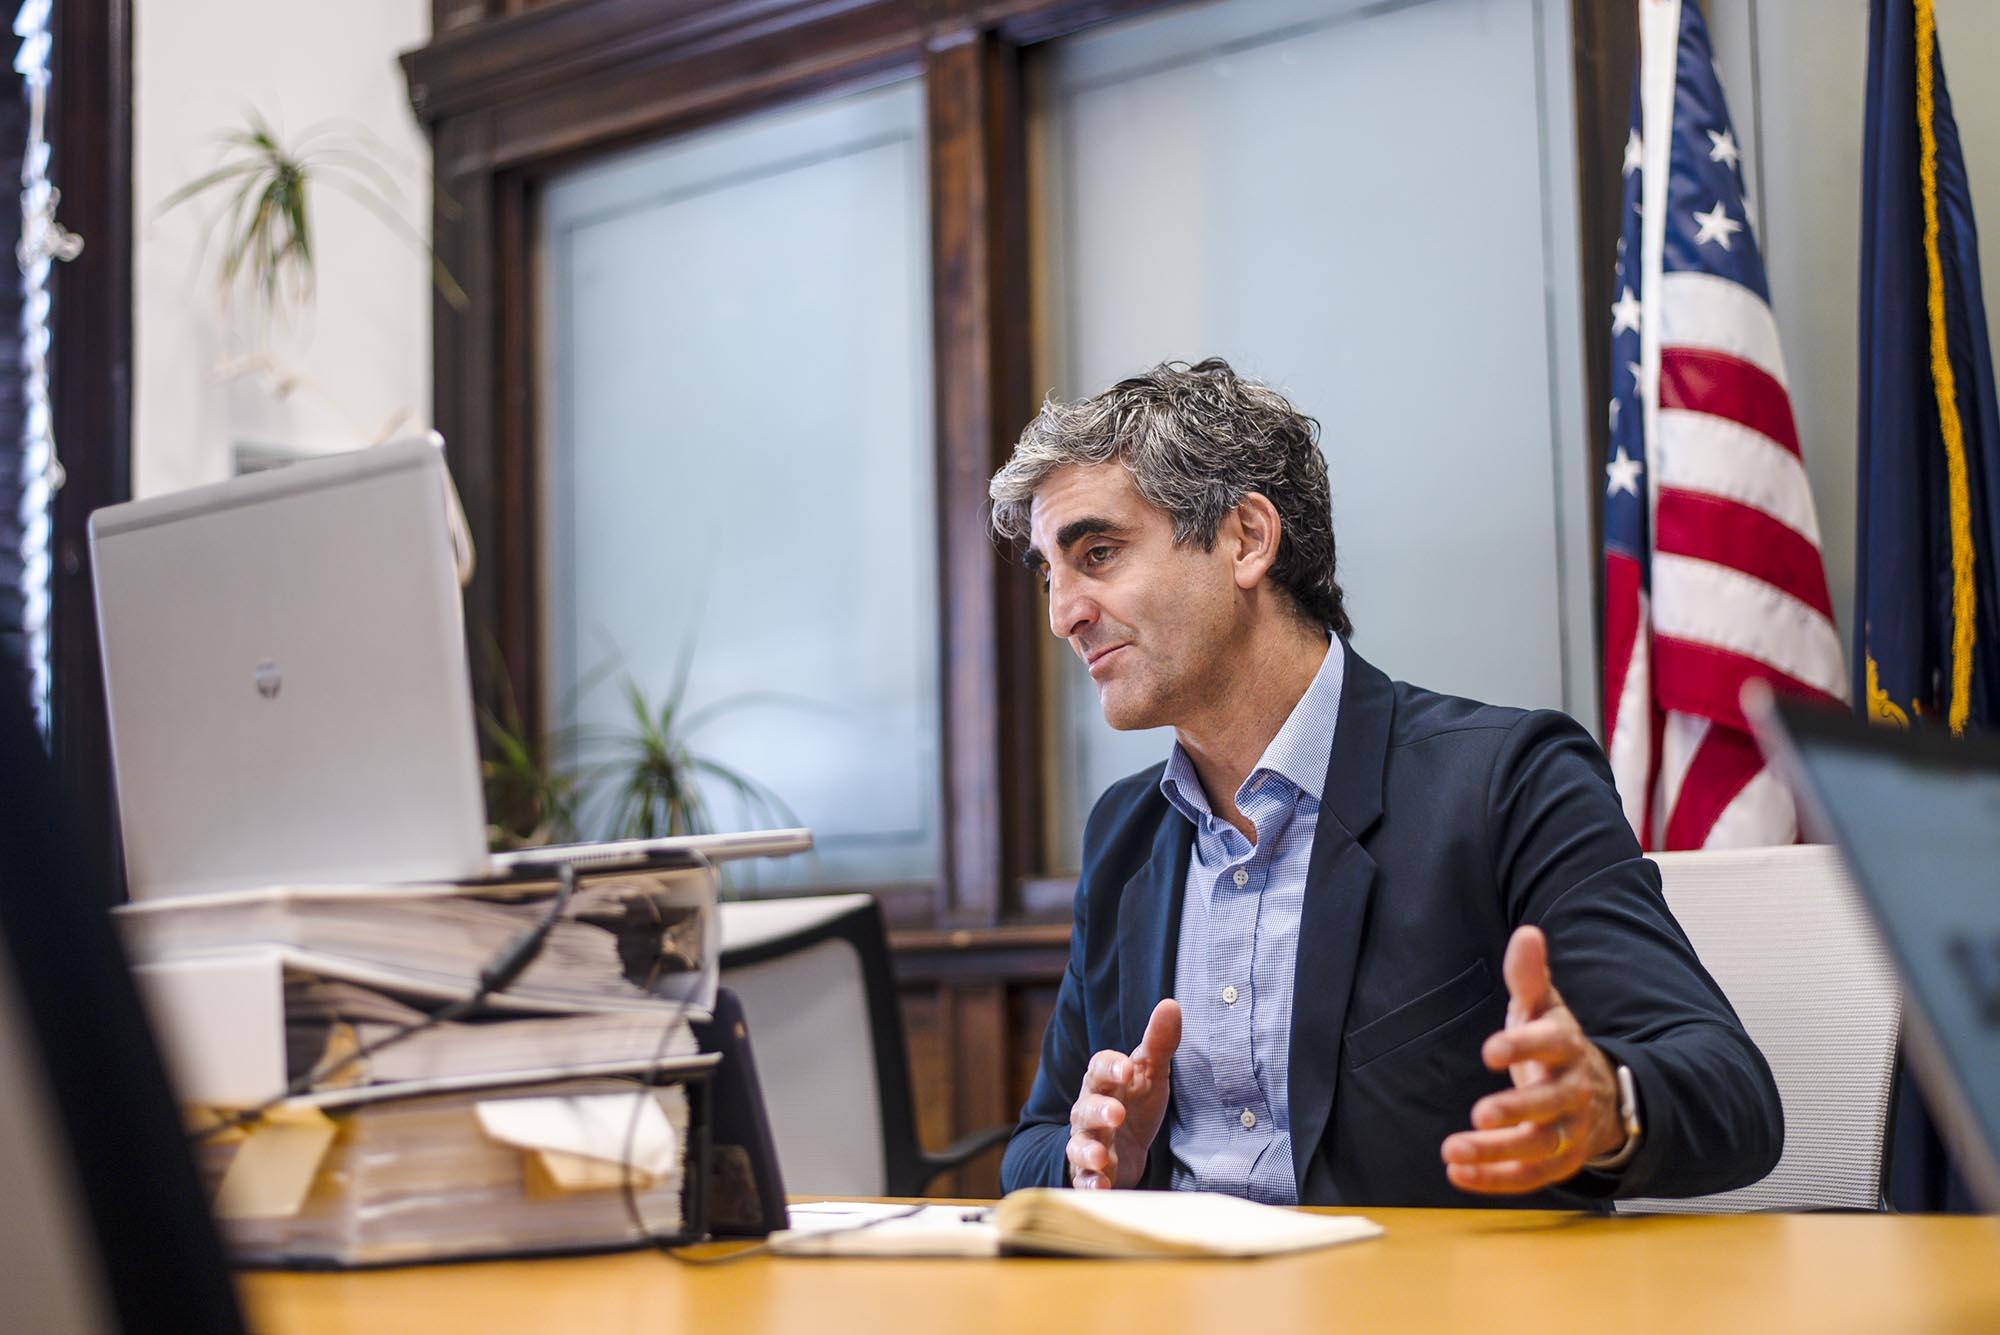 Weinberger vetoes 'hostile' police oversight board